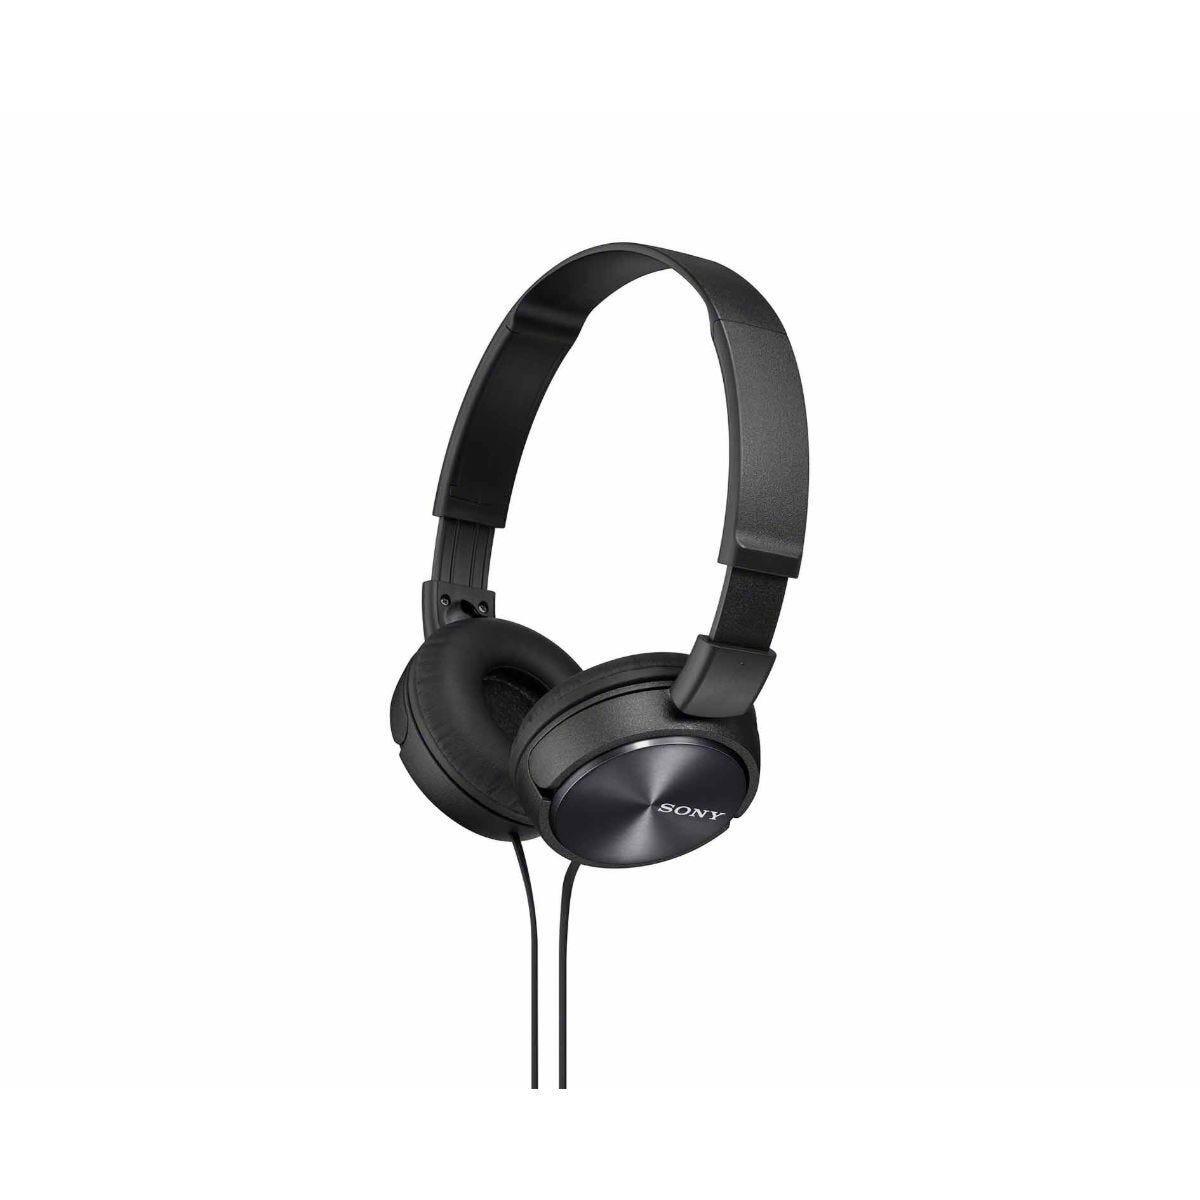 Sony ZX310 Foldable Headphones